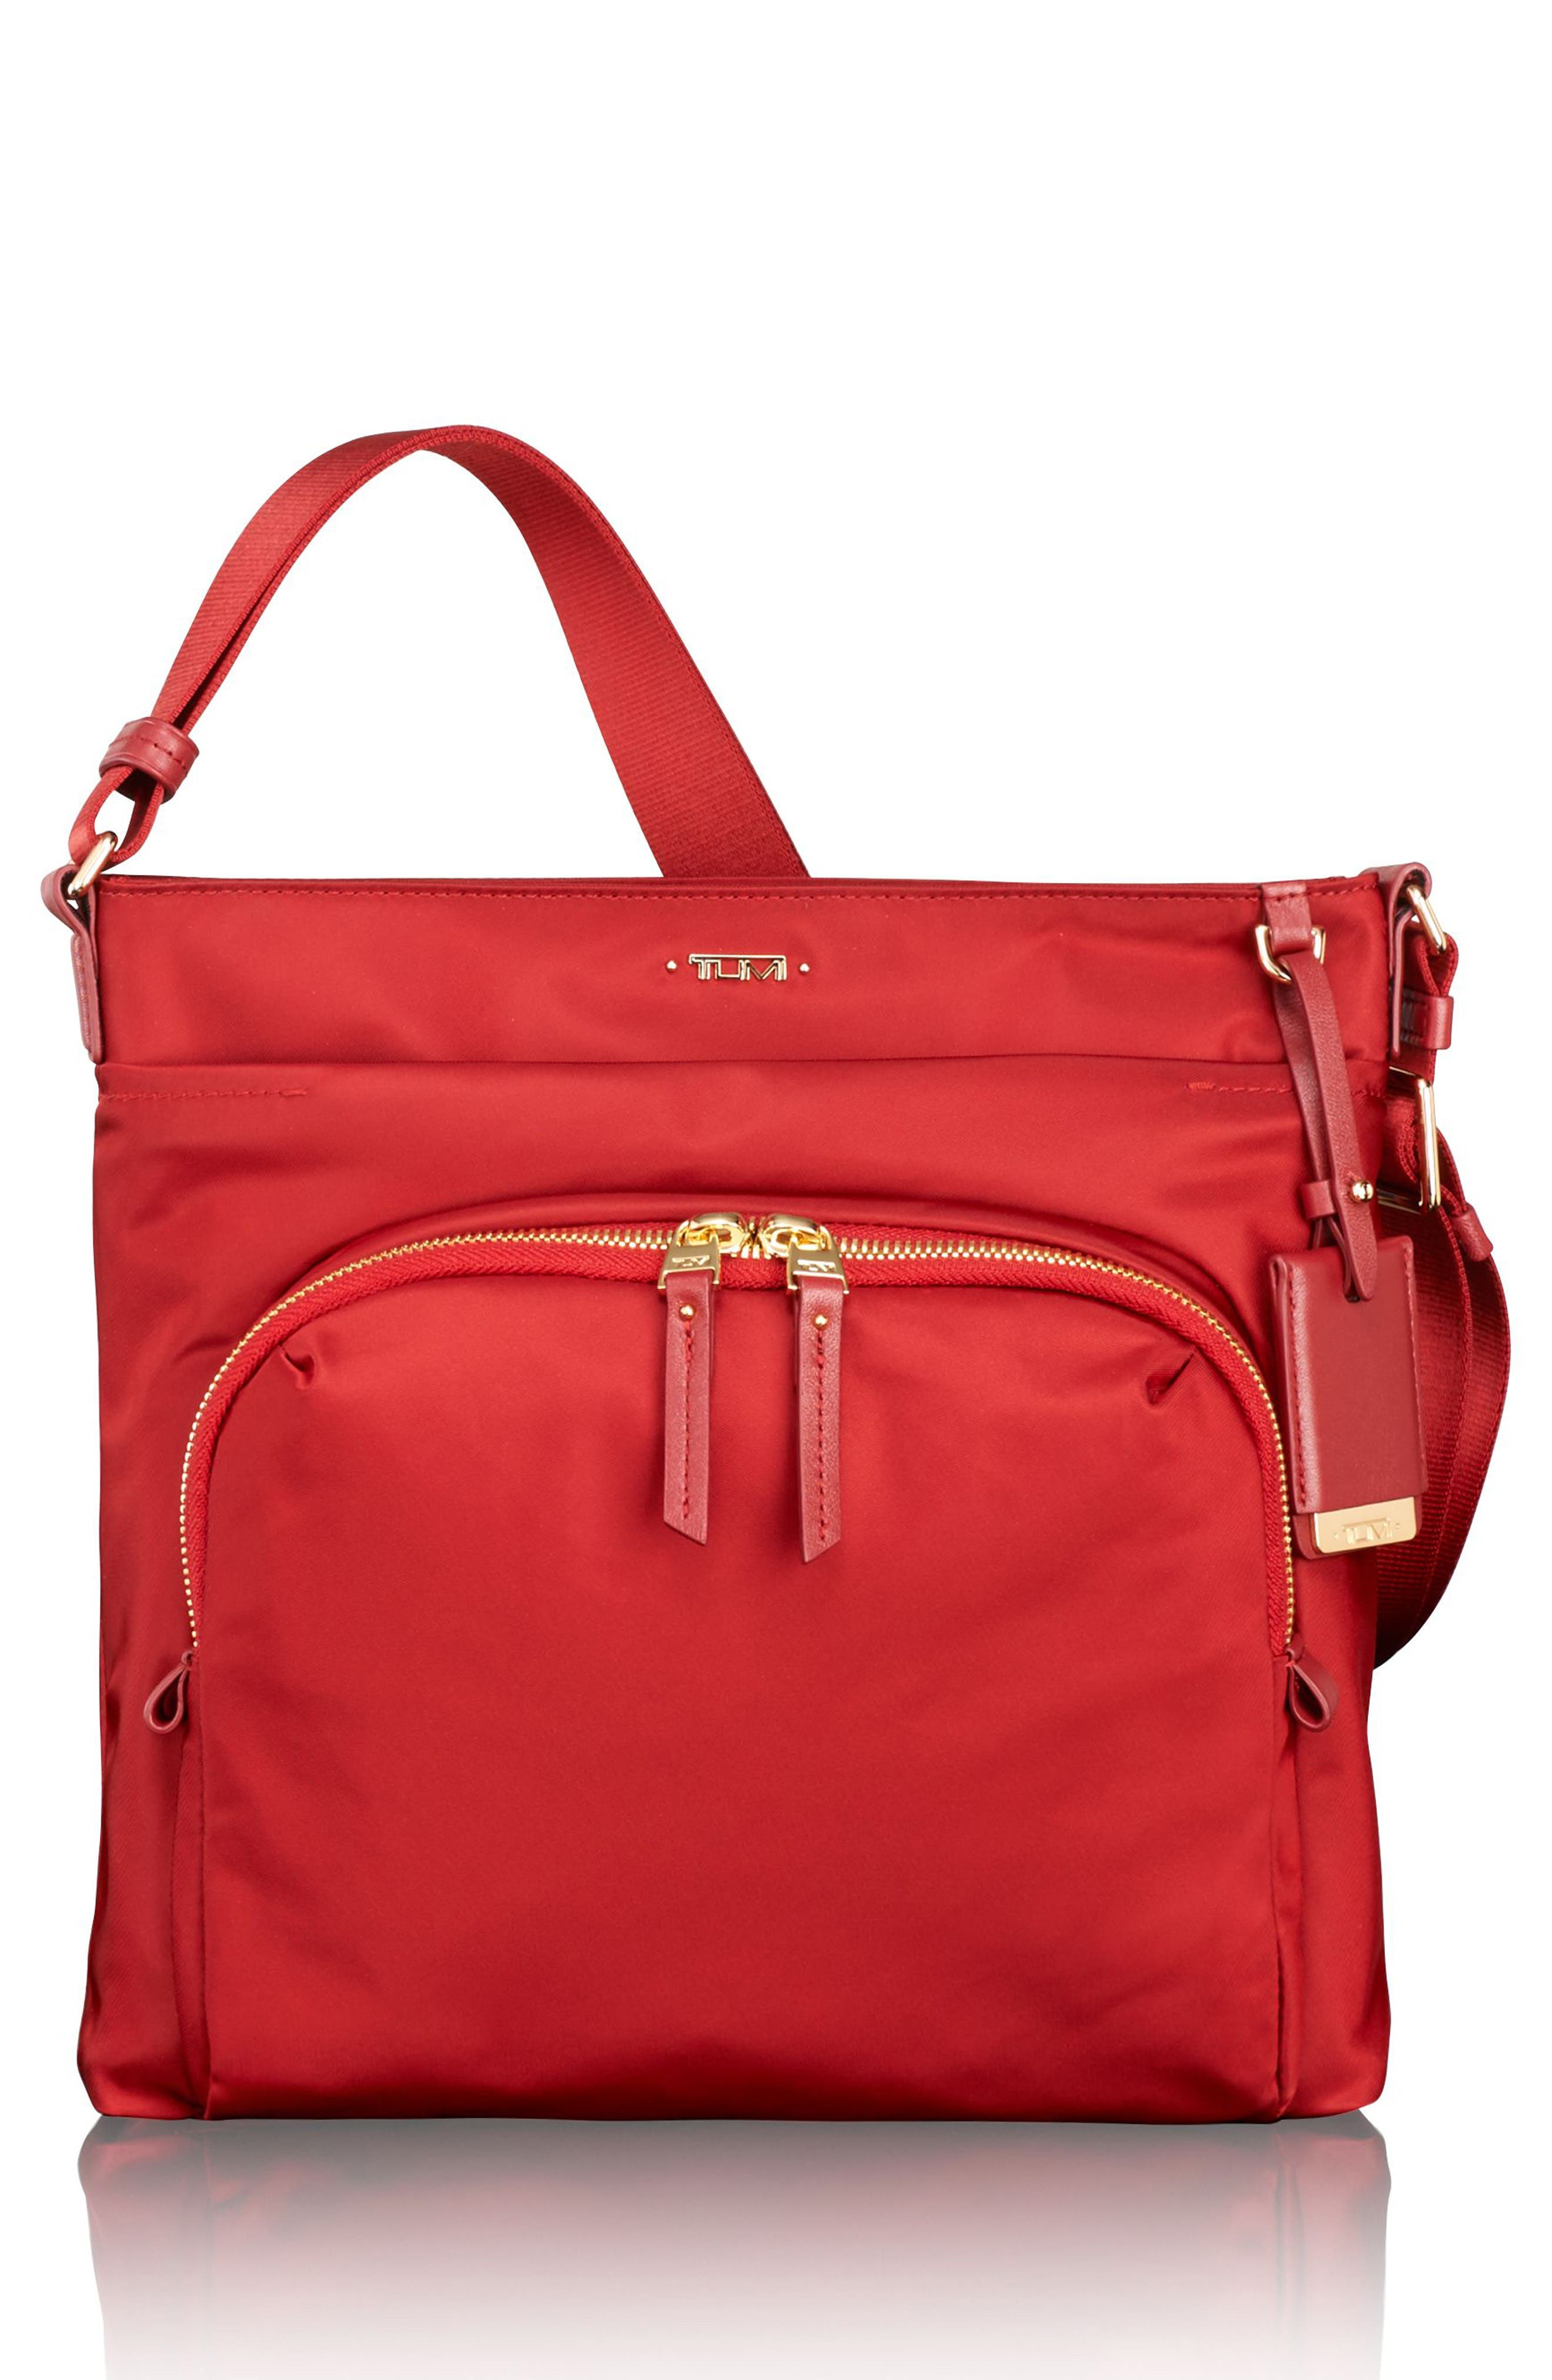 Alternate Image 1 Selected - Tumi Voyageur - Capri Nylon Crossbody Bag